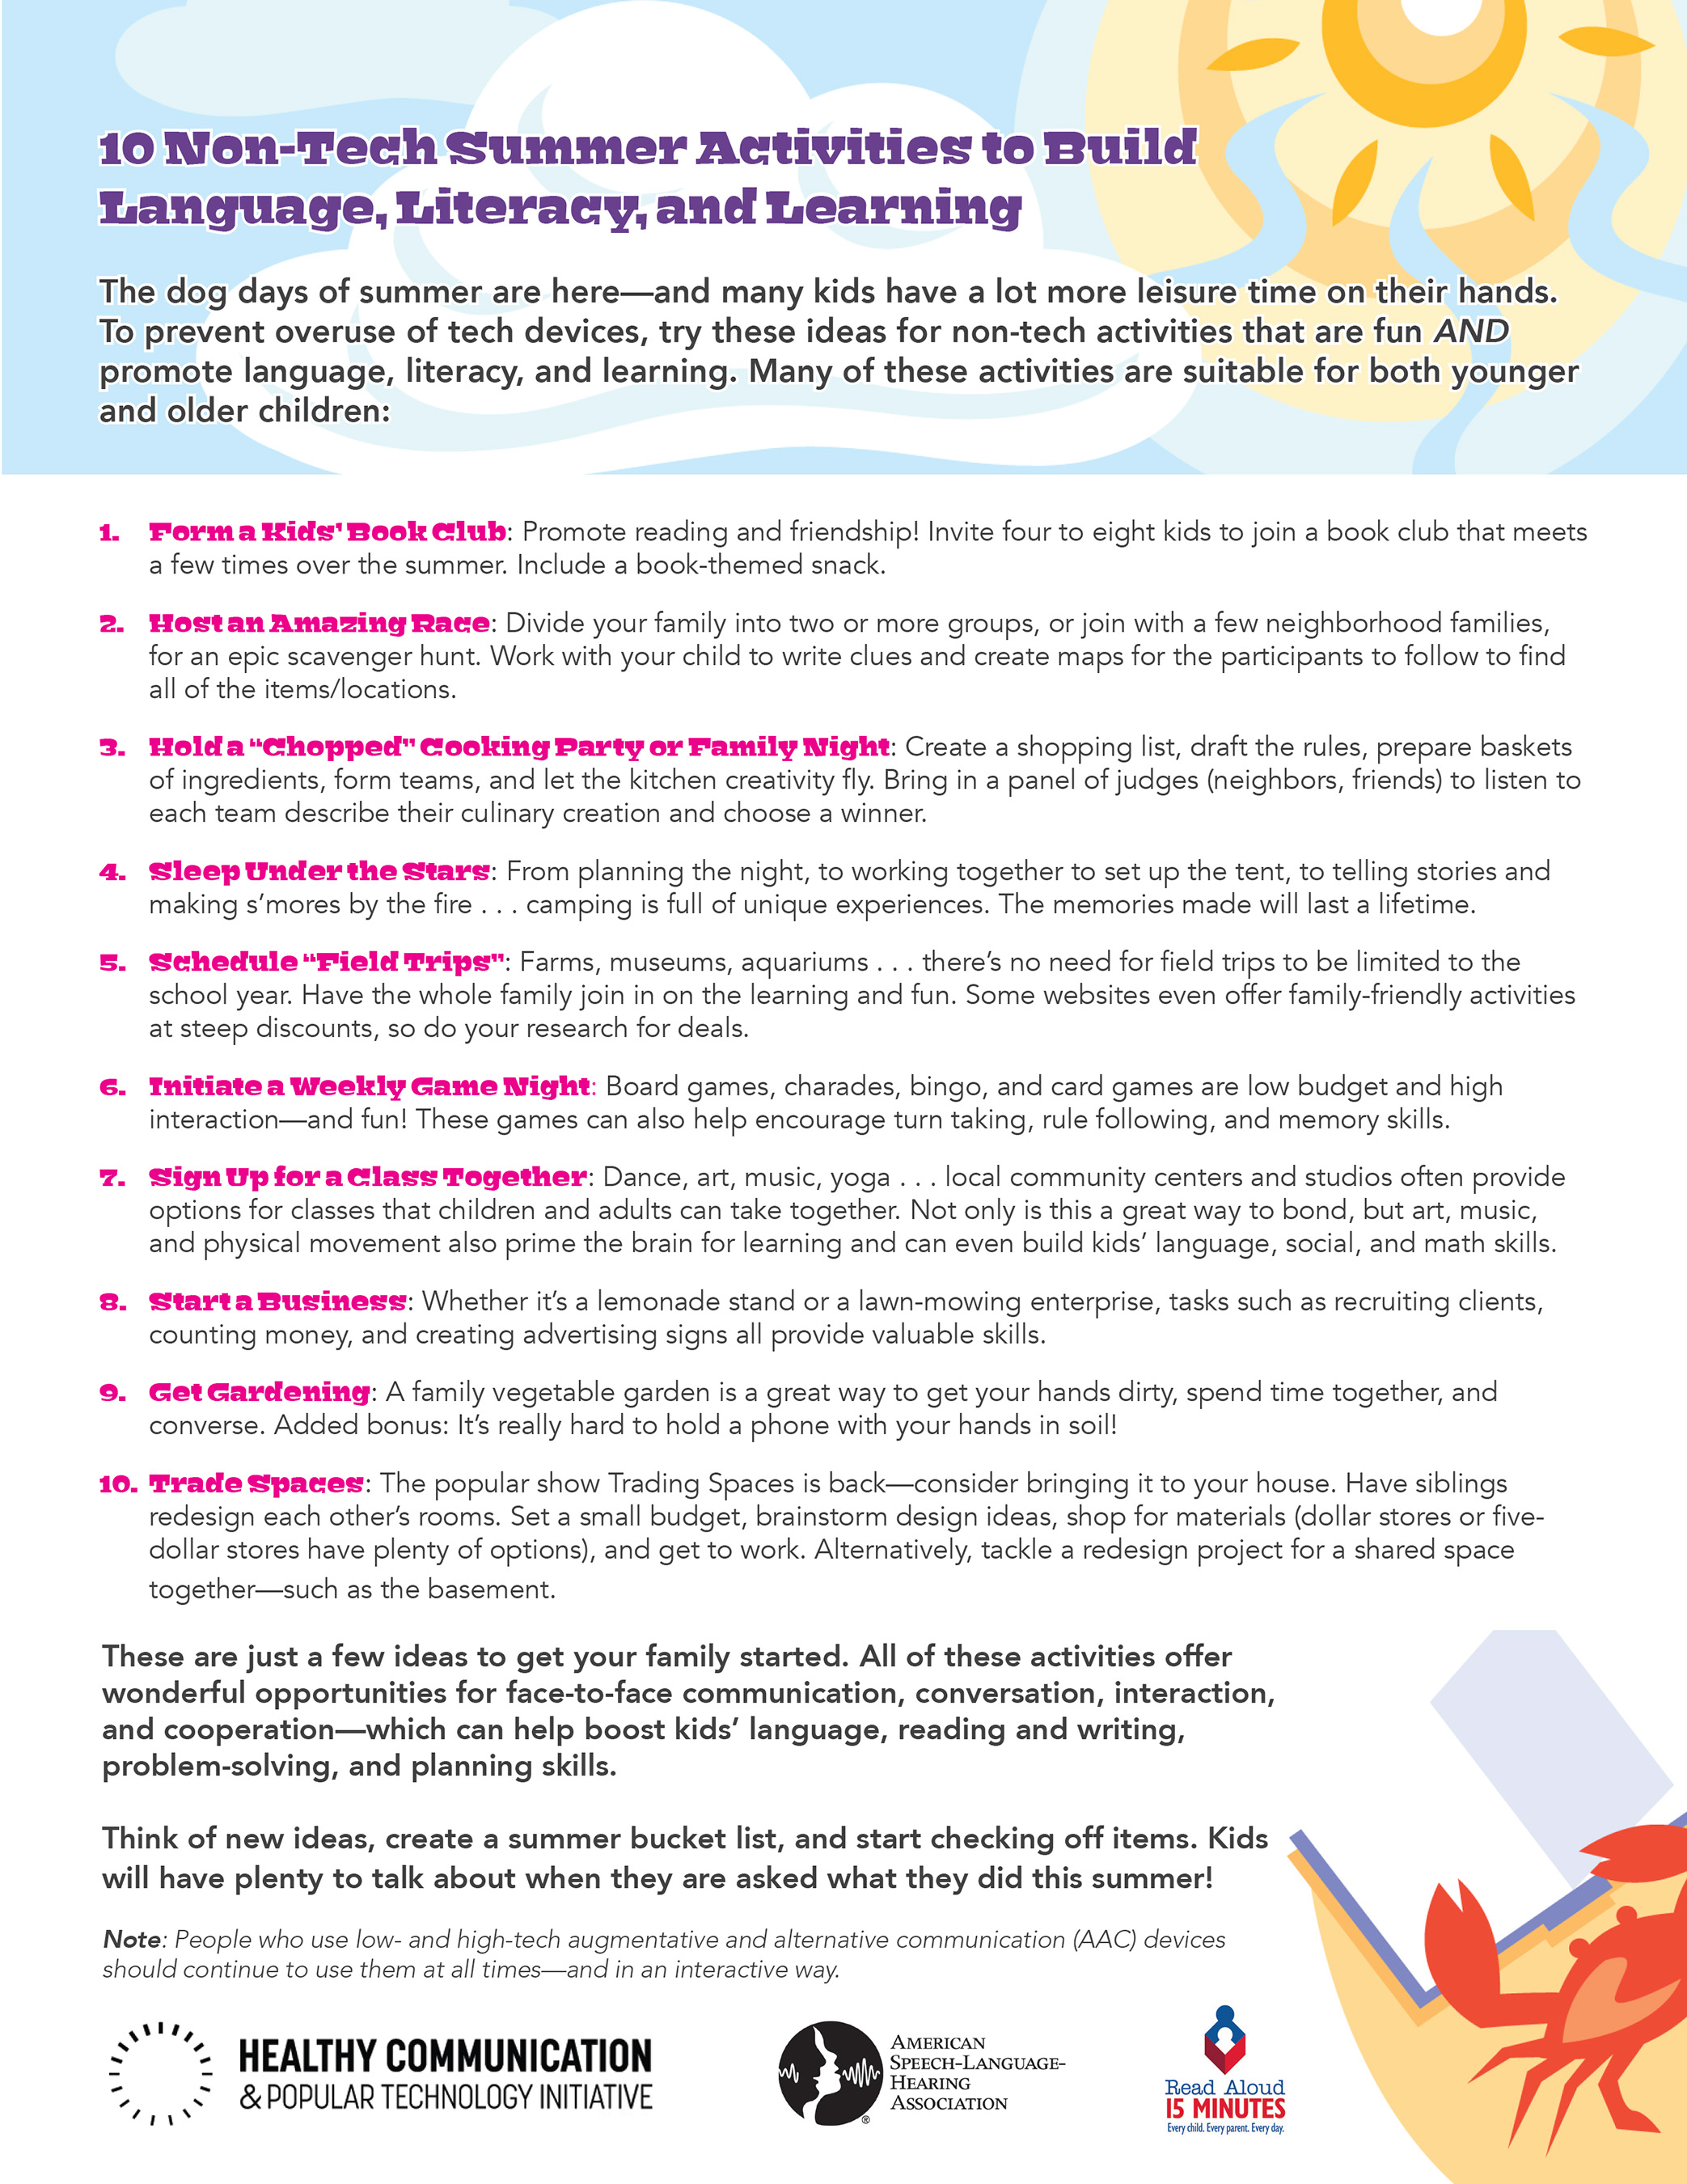 10 Non-Tech Summer Activities